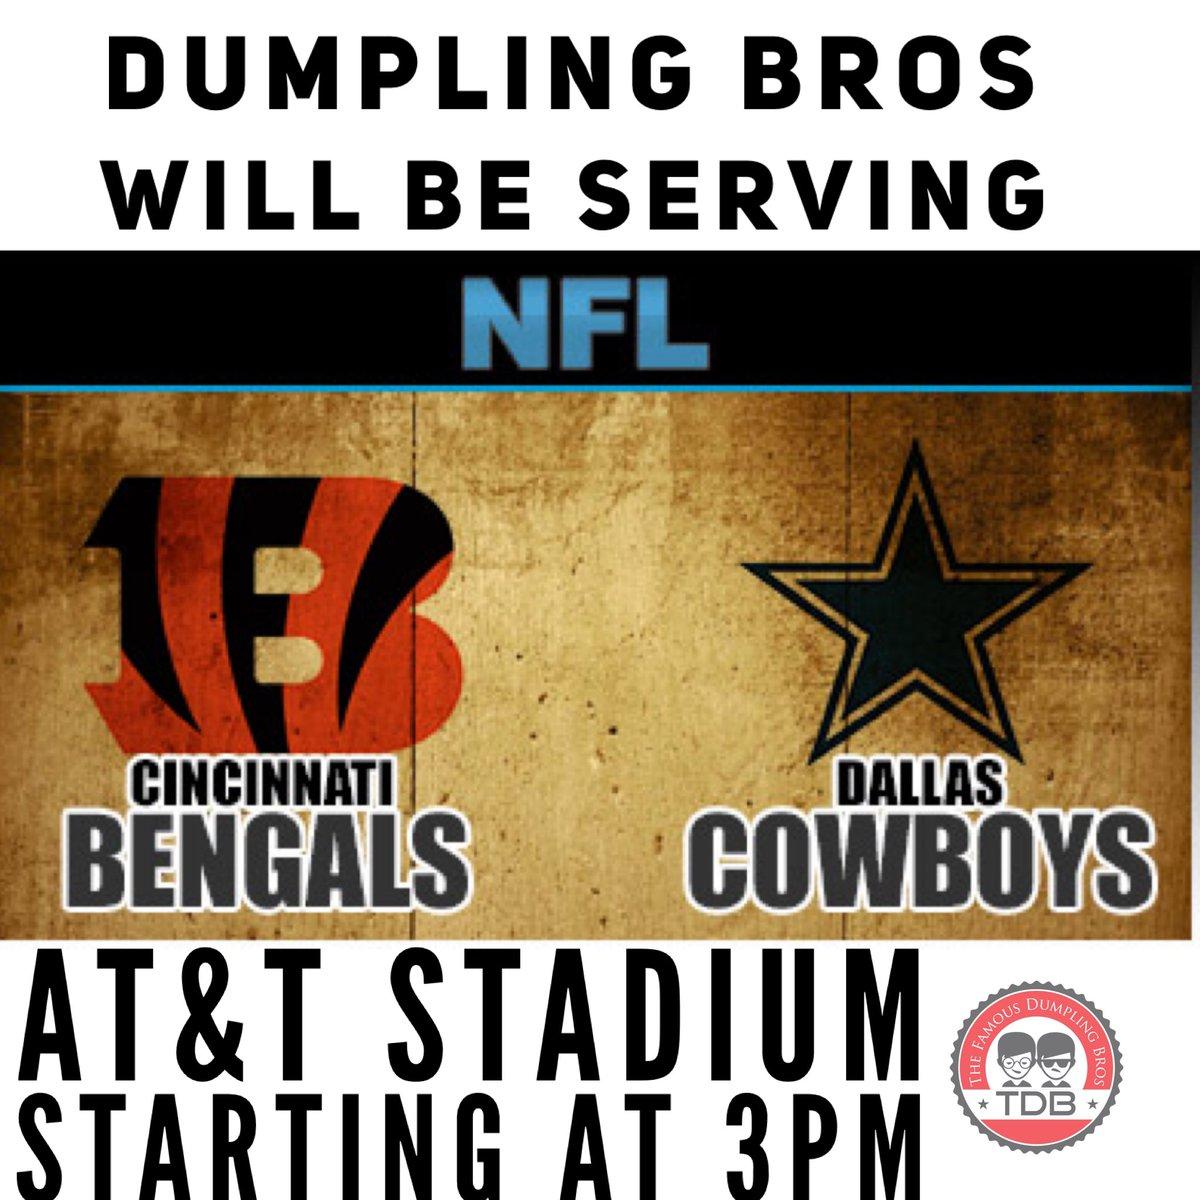 Serving at 3pm till @dallascowboys win the game! #NFL #footballseason #preseason #foodtruck #Catering #ballin #crushit #crushingit <br>http://pic.twitter.com/Gq4Ew0RMWs